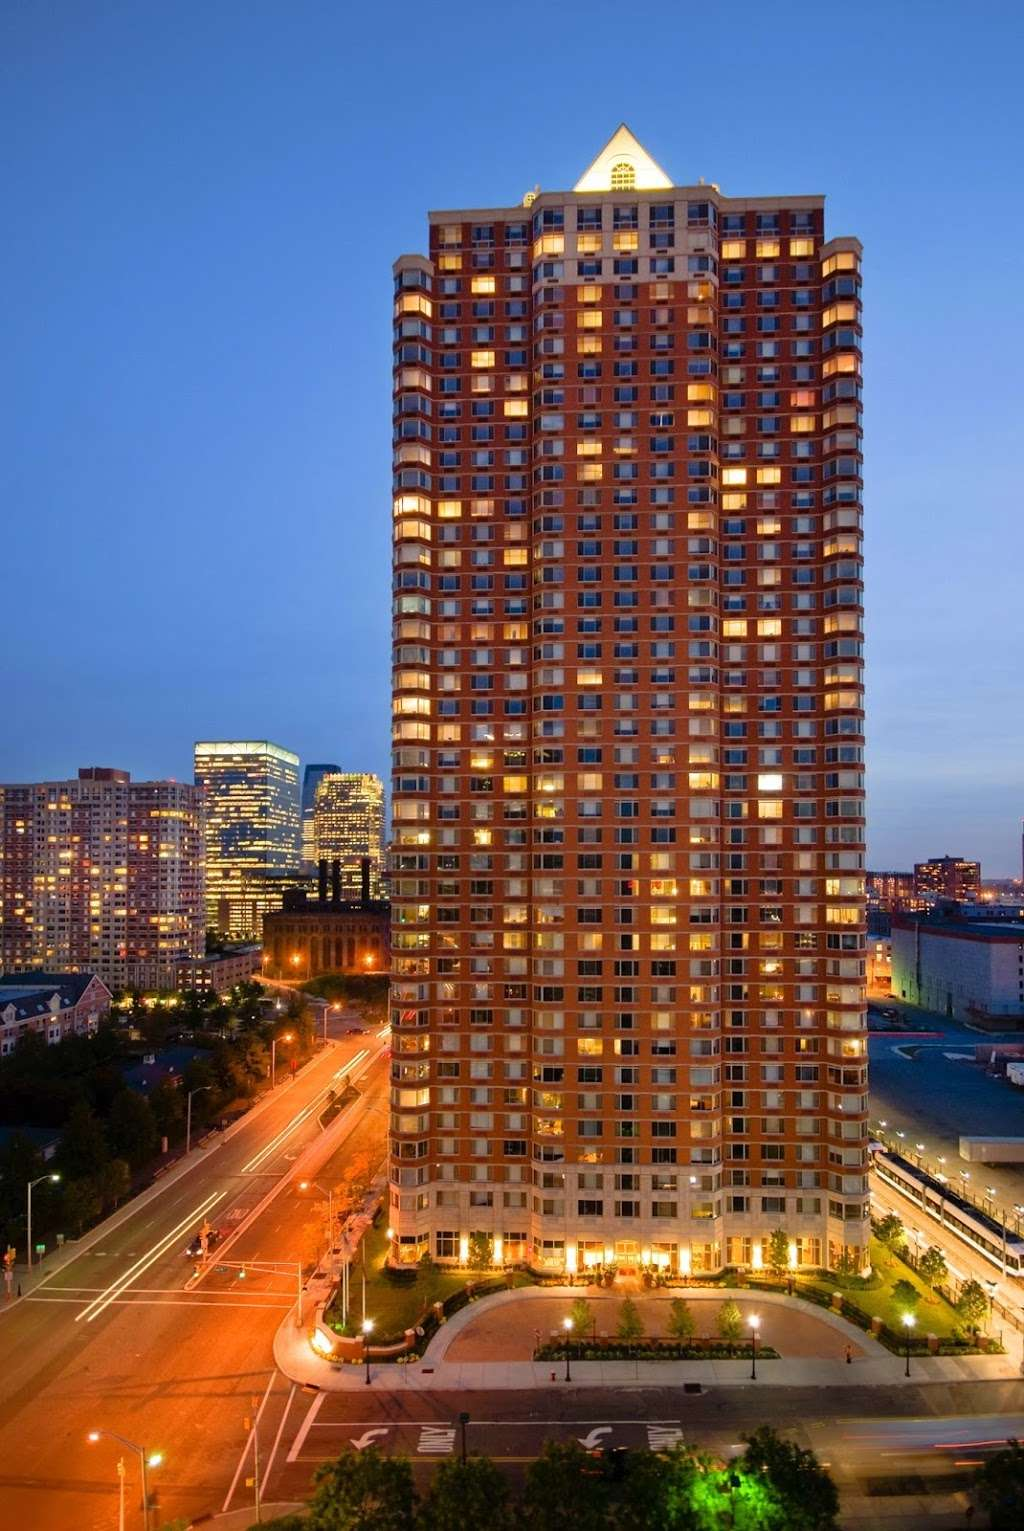 M2 at Marbella - real estate agency  | Photo 2 of 10 | Address: 401 Washington Blvd, Jersey City, NJ 07310, USA | Phone: (201) 620-2338